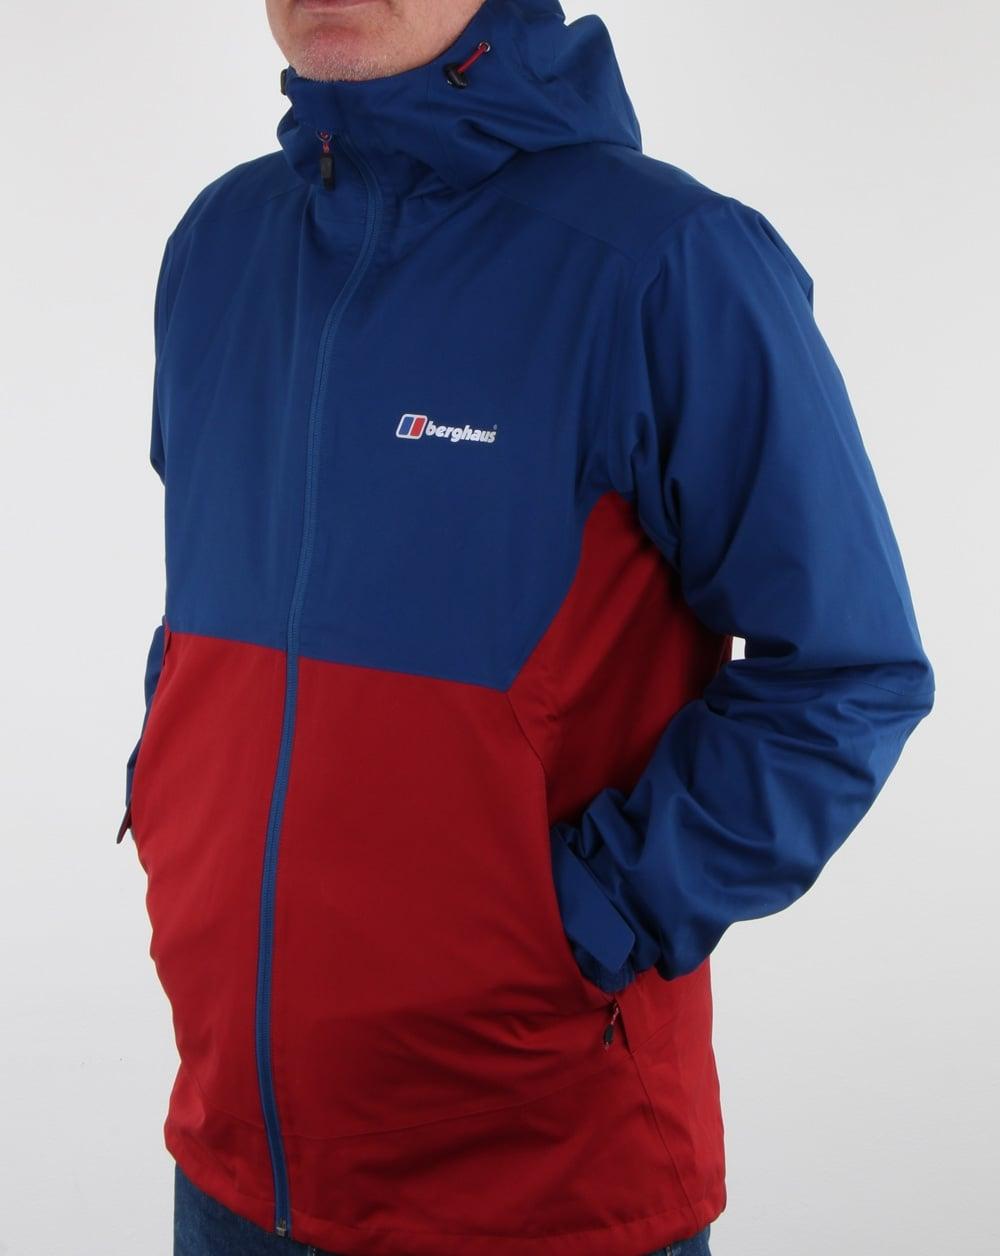 96276ff62 Berghaus Fellmaster Shell Jacket Red Dahlia/Blue | 80s casual classics